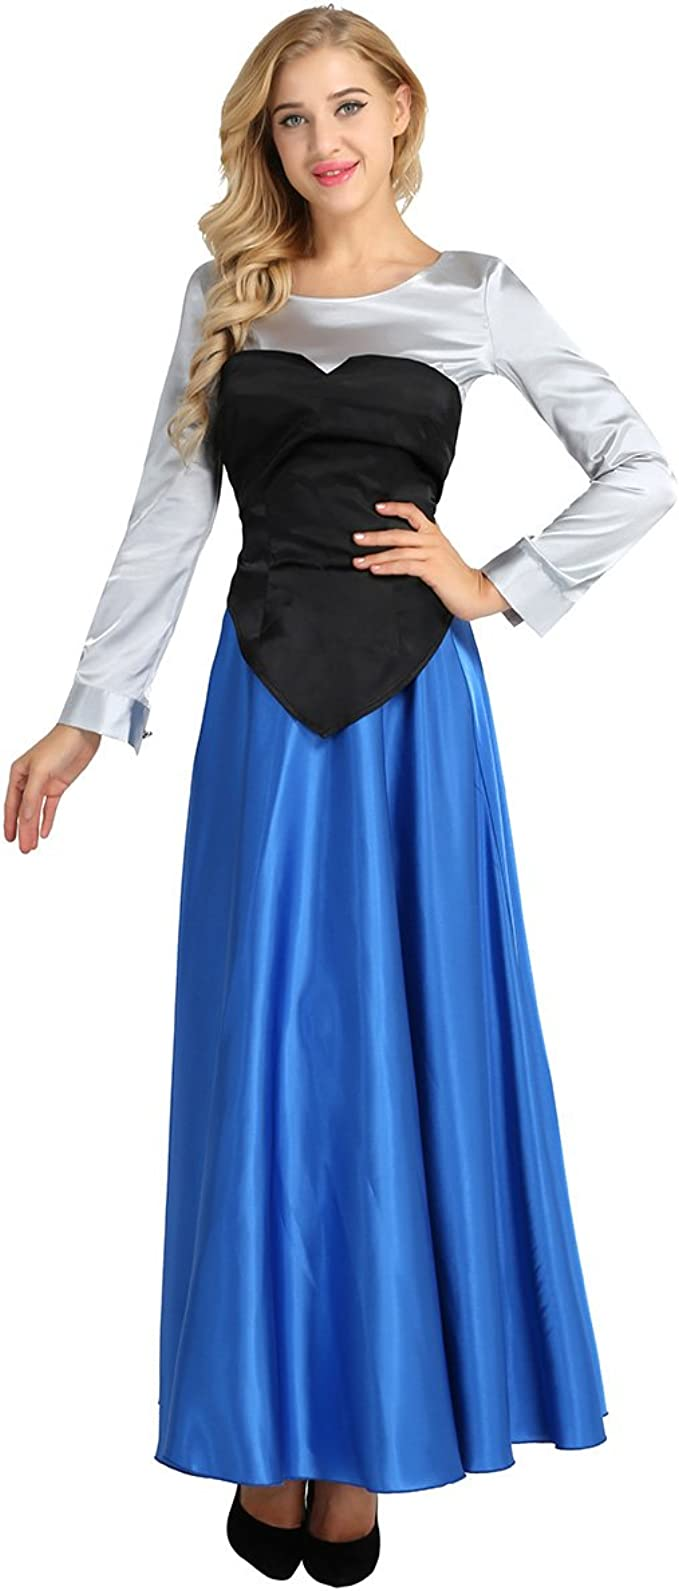 inlzdz Mujer Disfraces de Princesa para Carnaval Fiesta 3PCs ...